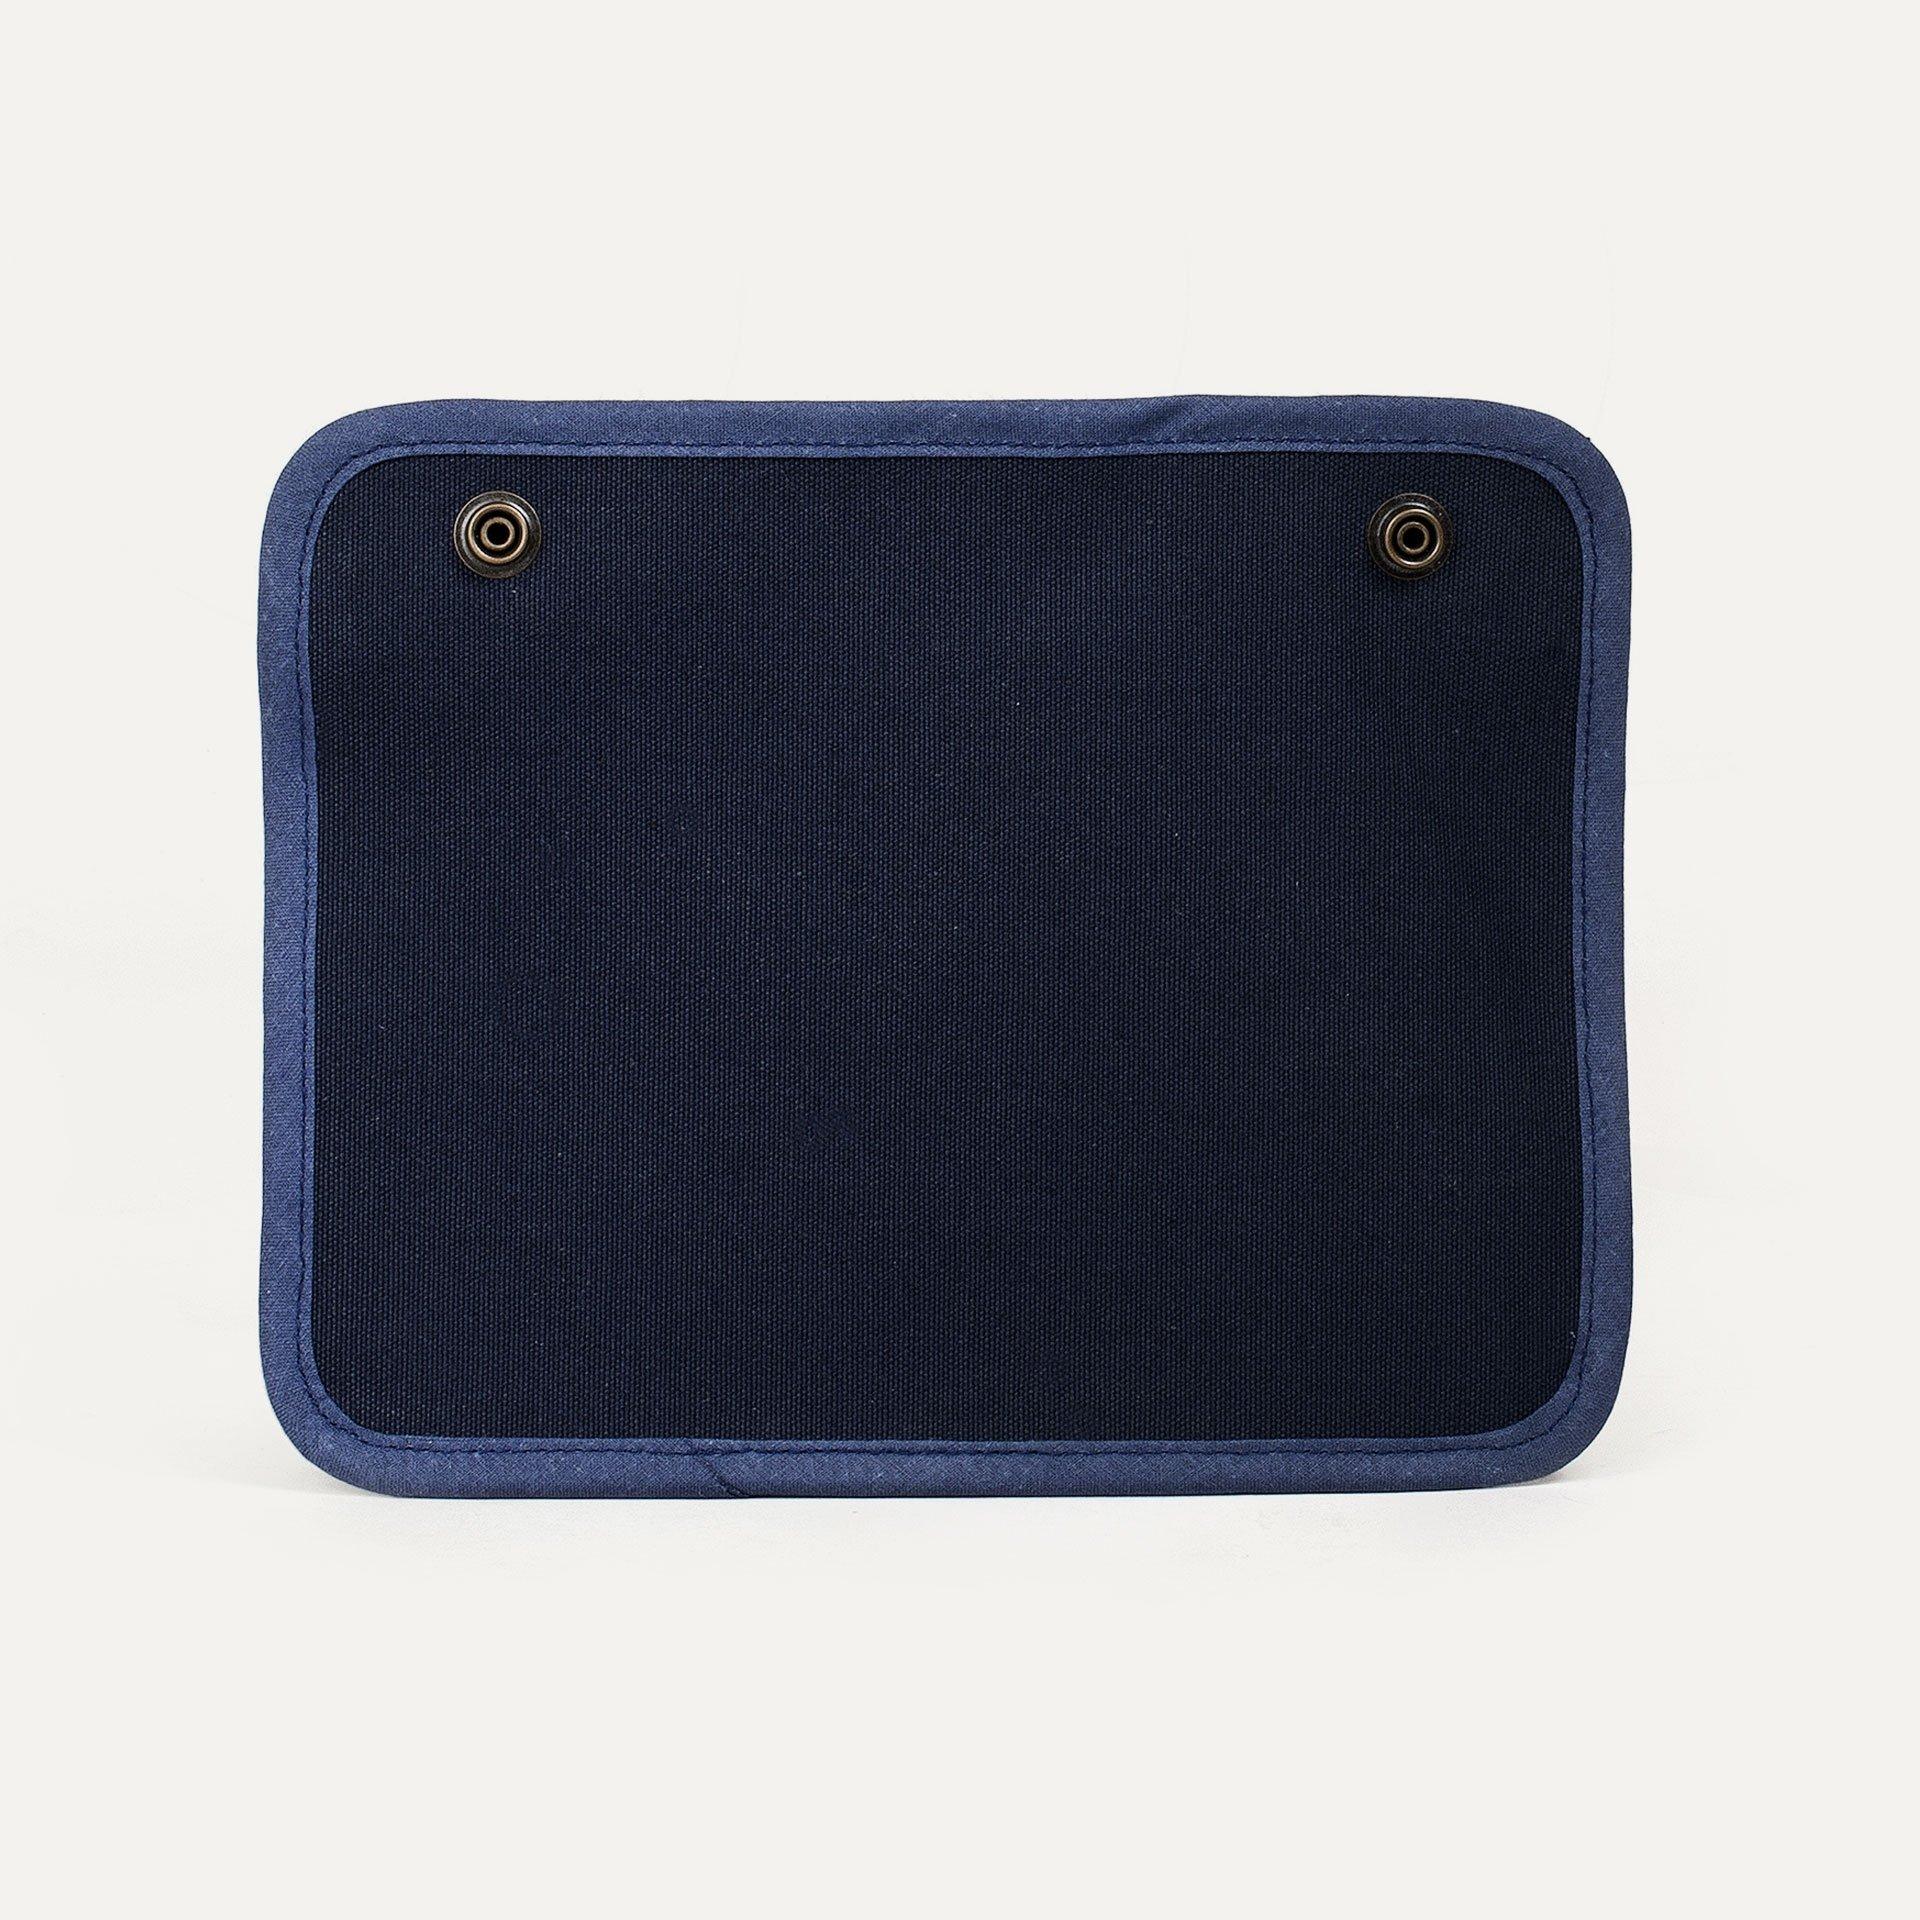 Poche zippée - Bleu (image n°2)